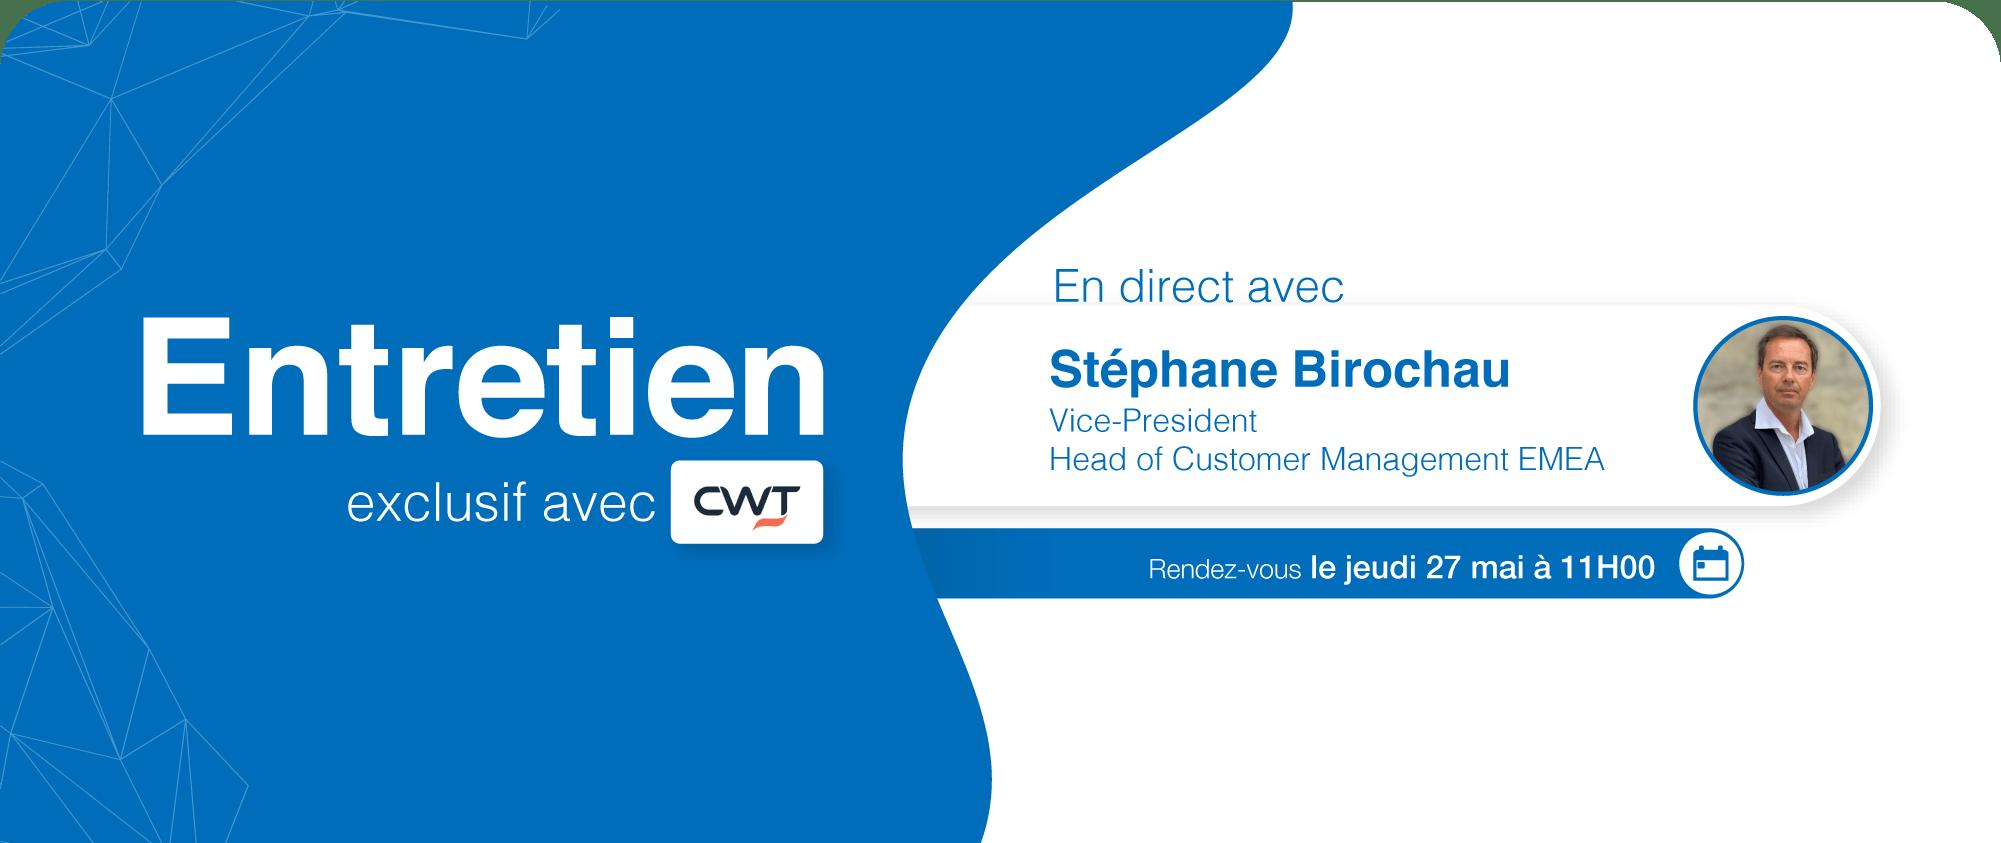 Entretien exclusif avec CWT : en direct avec Stephane Birochau Vice-President Head of Customer Management EMEA